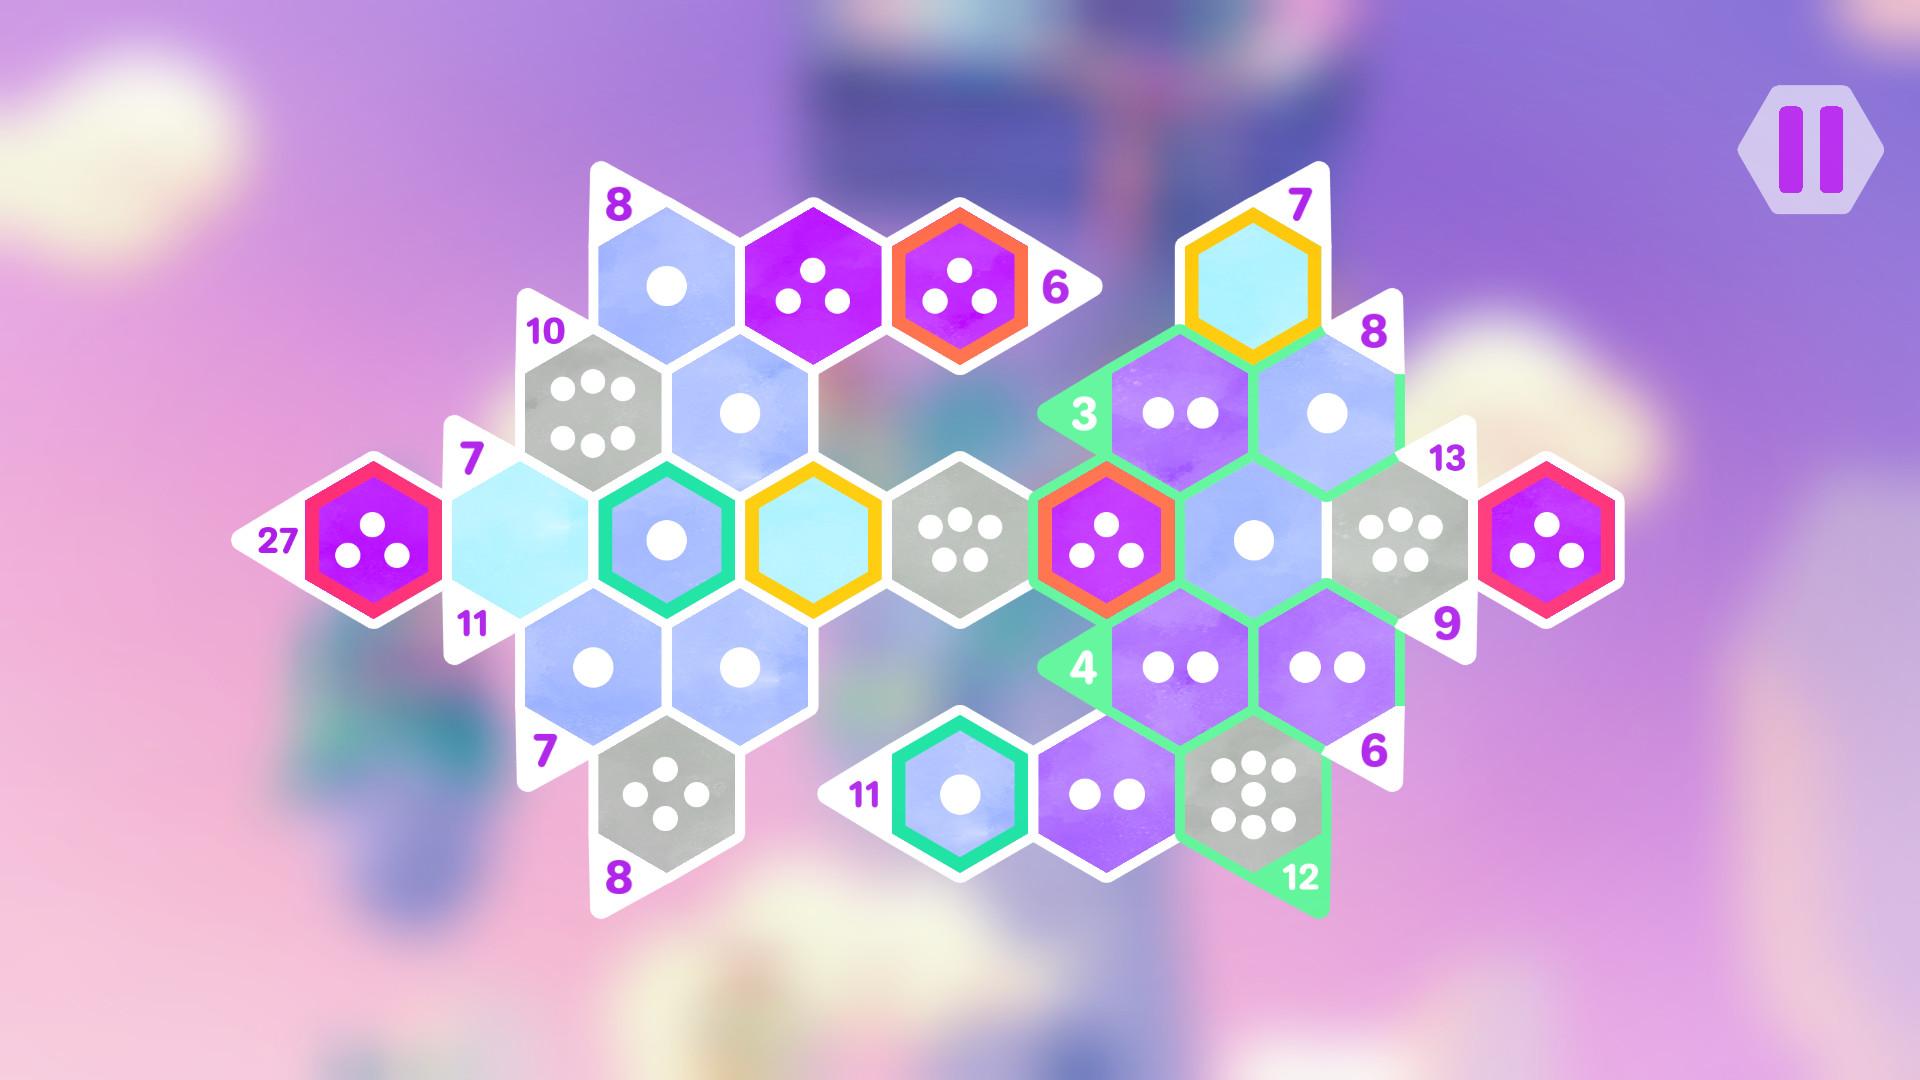 Hexologic receives a huge content update